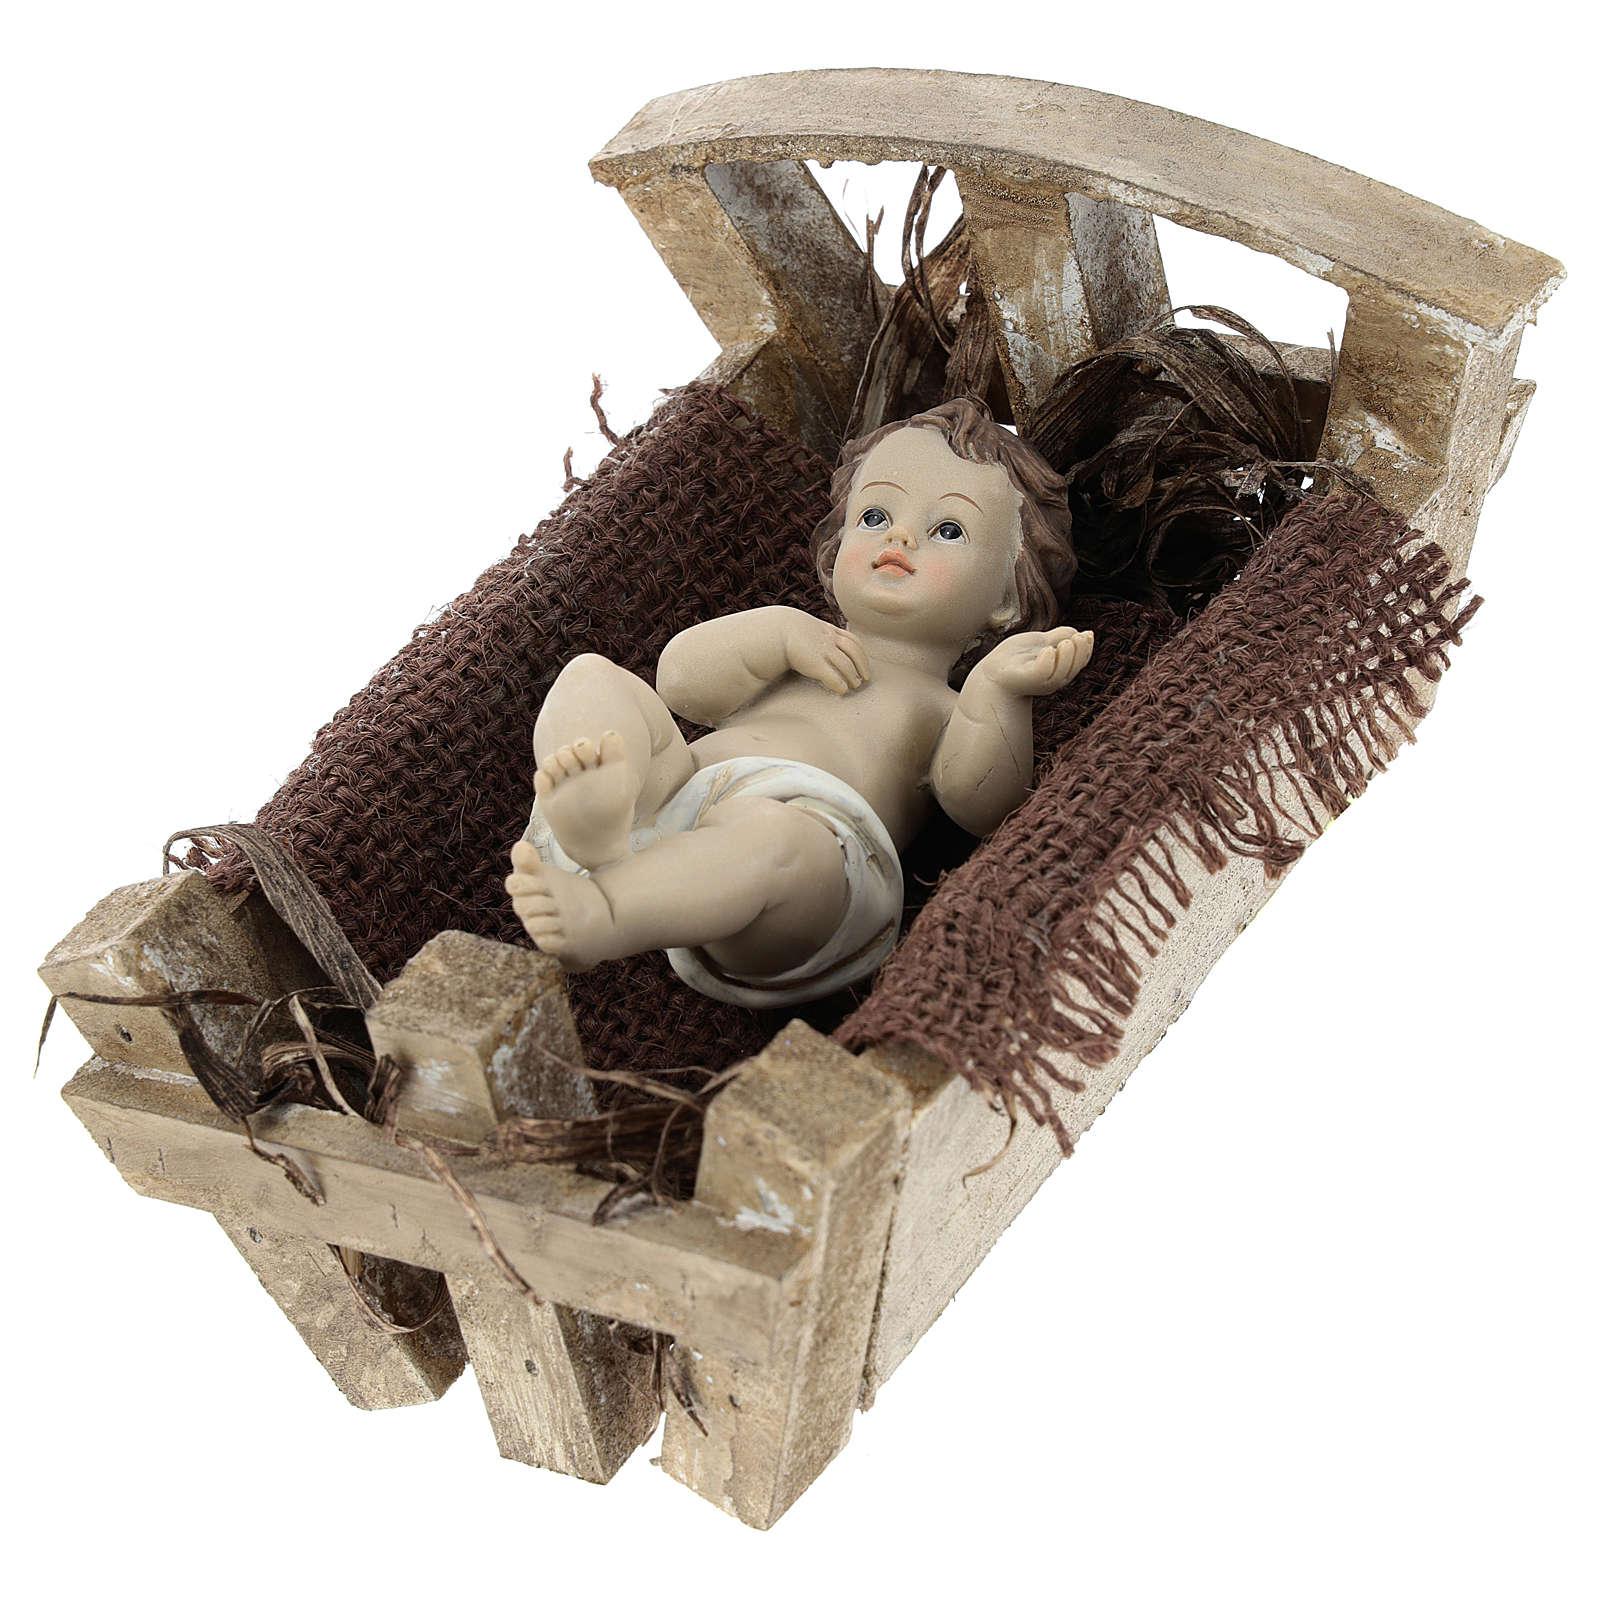 Niño Jesús resina con cuna madera 16 cm (altura real) 3